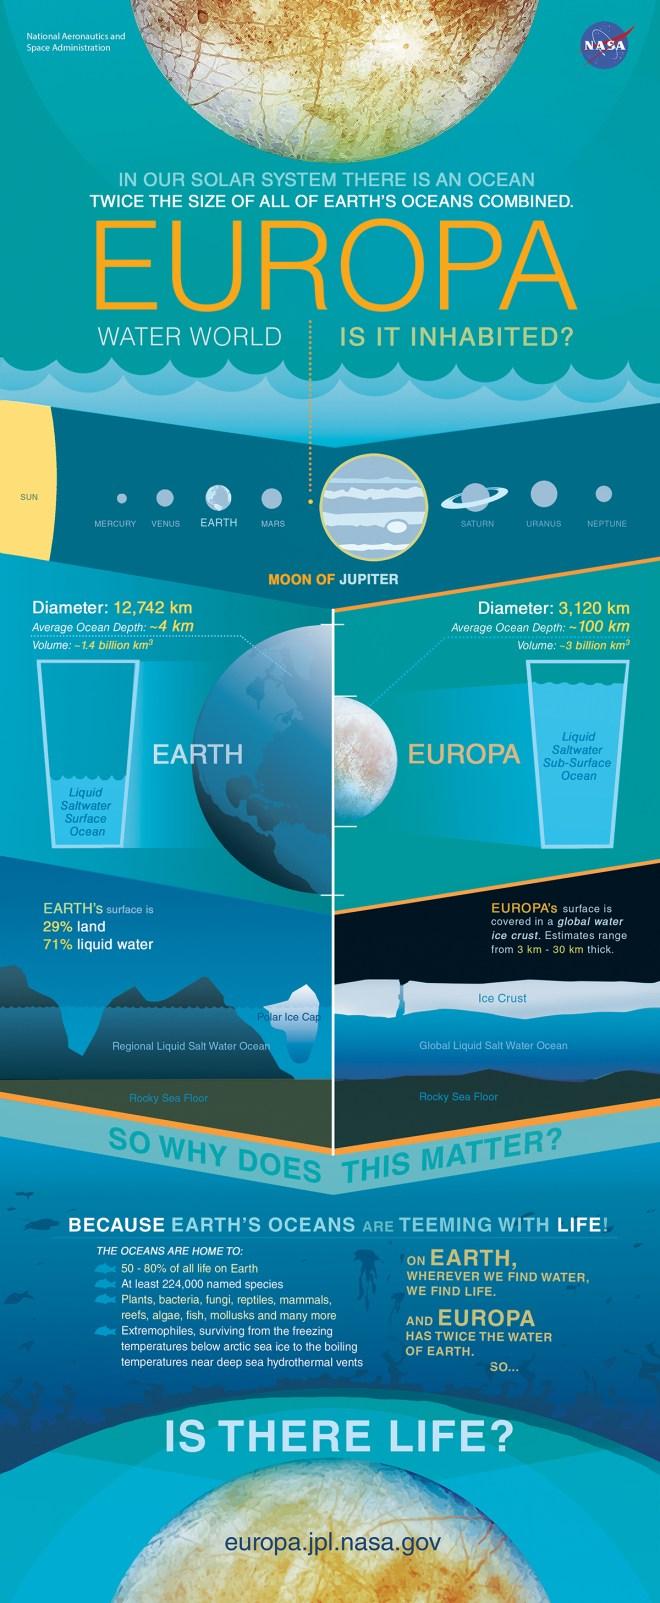 Illustration courtesy Jet Propulsion Laboratory